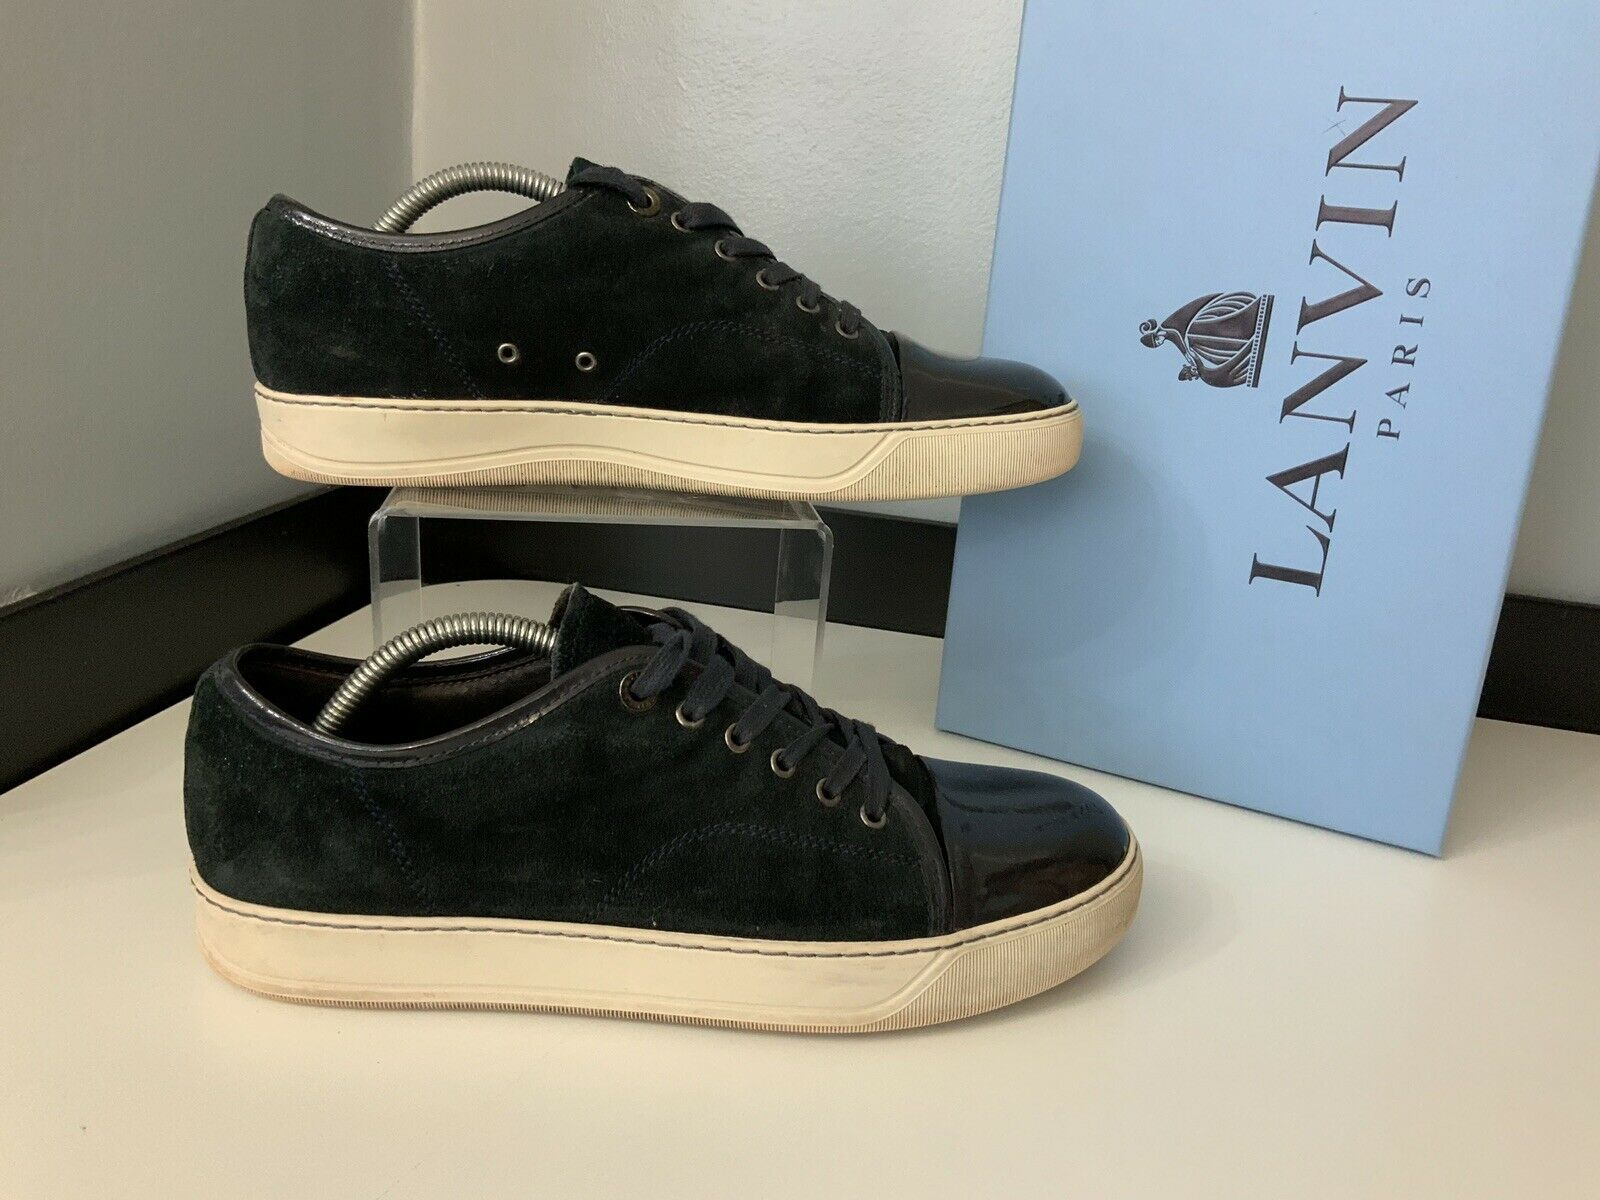 Lanvin Mens Sneakers, shoes, Eu41, Navy bluee Suede, VGC